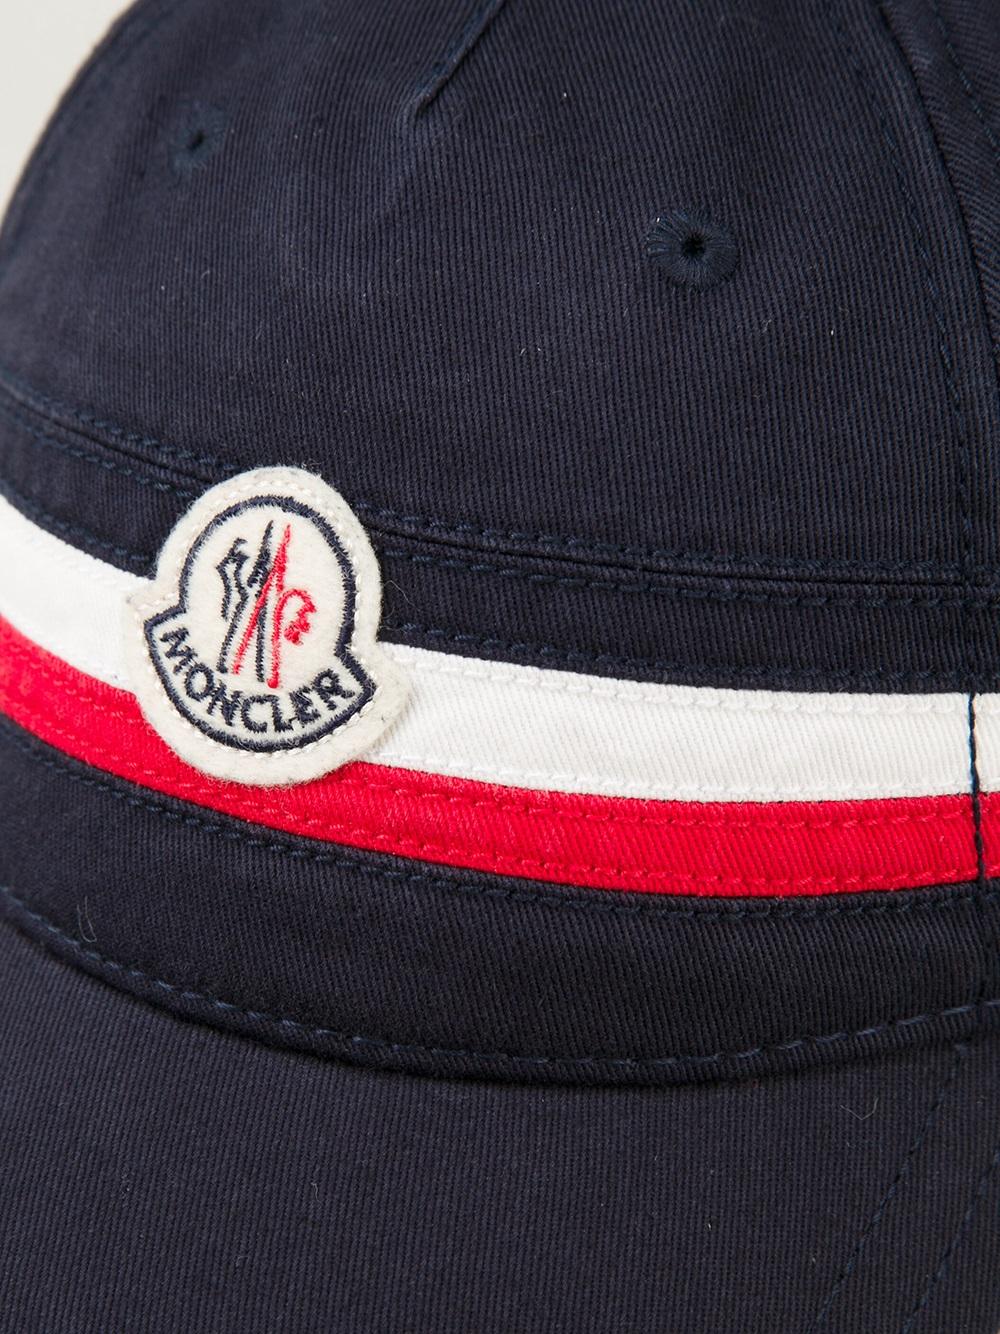 moncler bucket hat camo 251c744a951